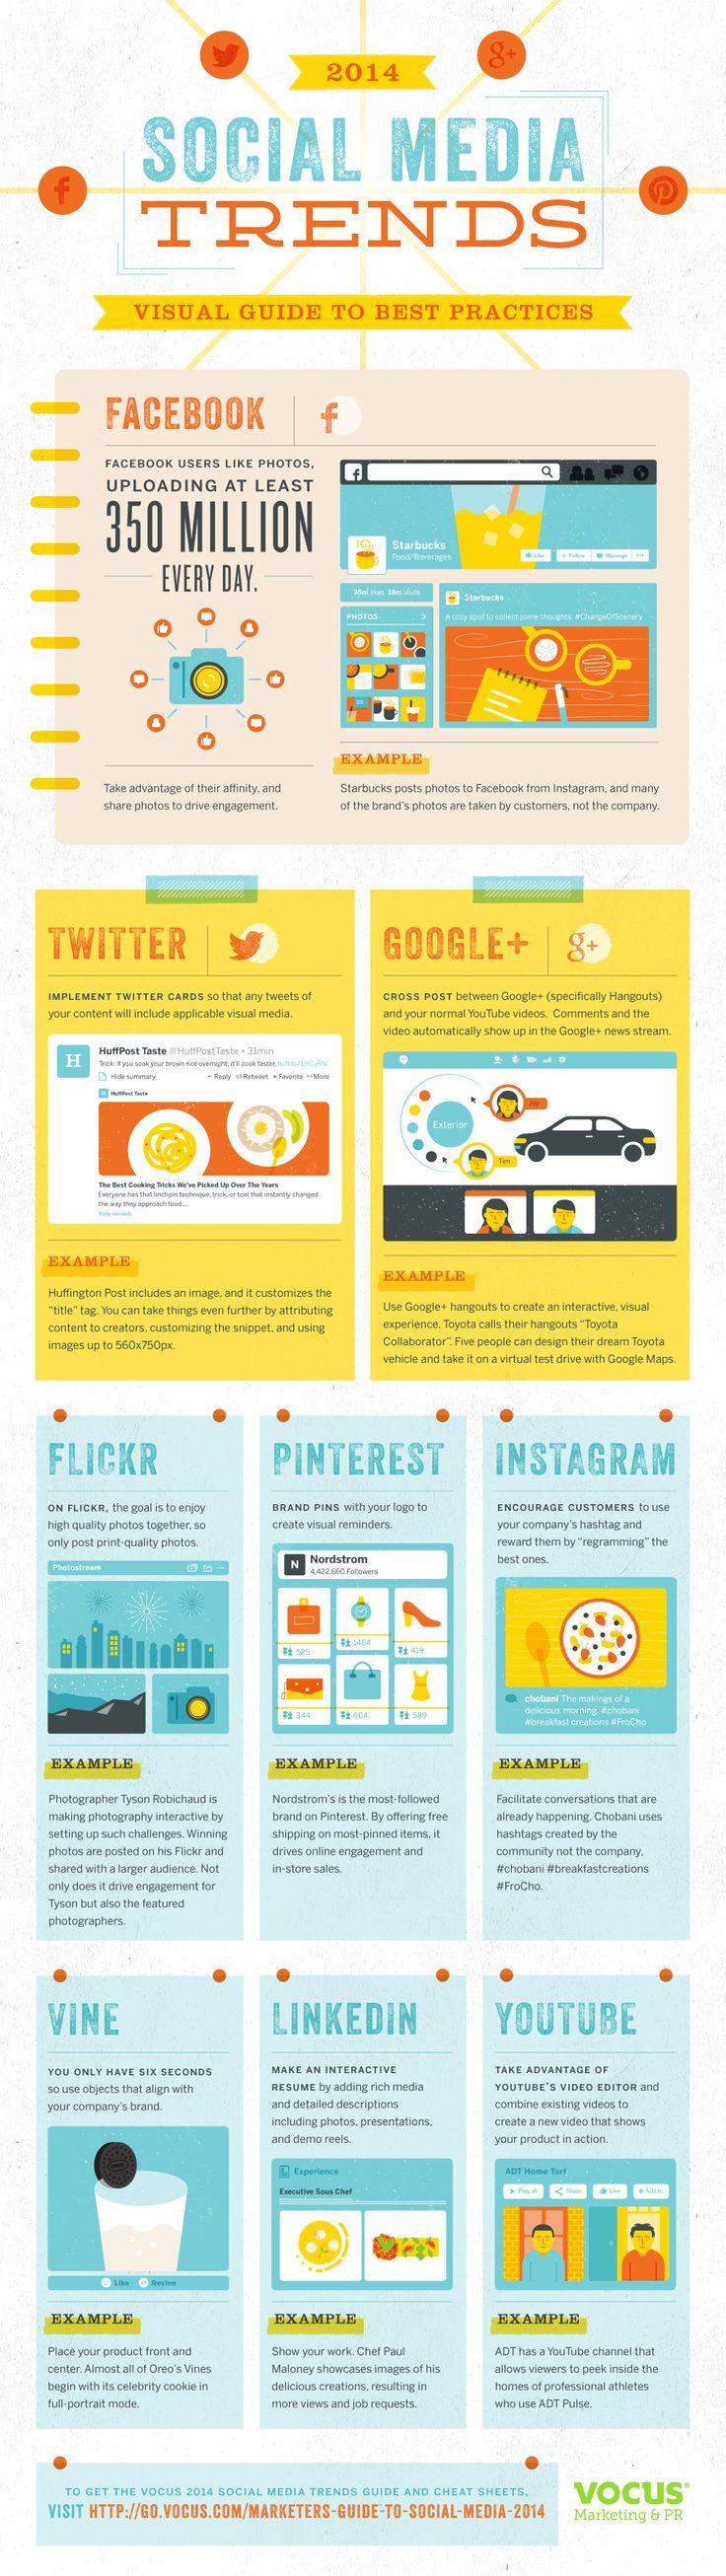 #INFOGRAPHIC Social Media Best Practices for Marketers in 2014 [Infographic] - SocialTimes #socialmedia #smm via @Davide Meroni Meroni Meroni Licordari